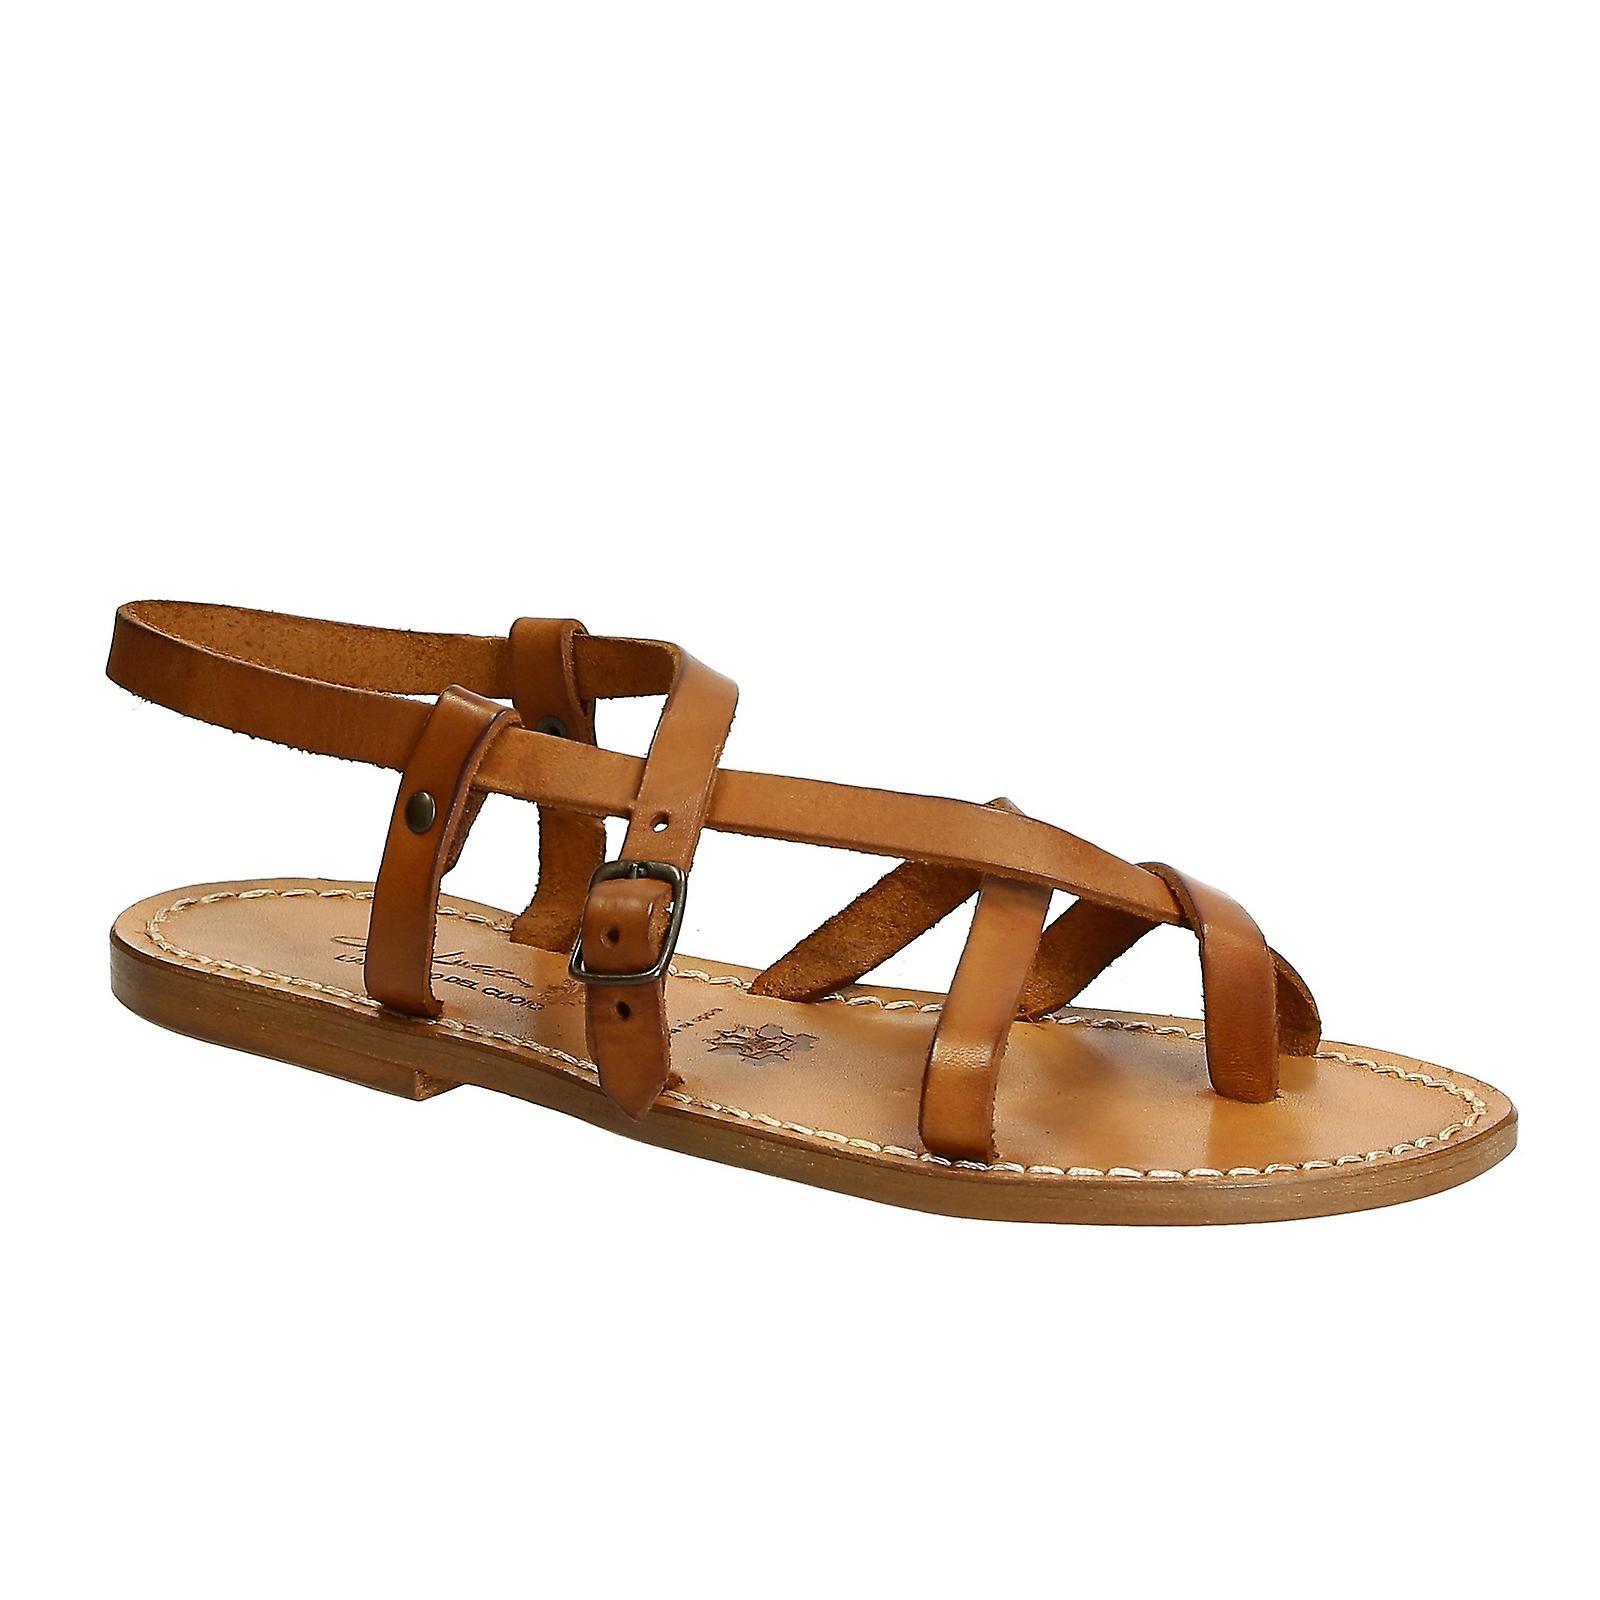 Gianluca - L'artigiano Del Cuoio 809sandbeige Women's Beige Leather Sandals